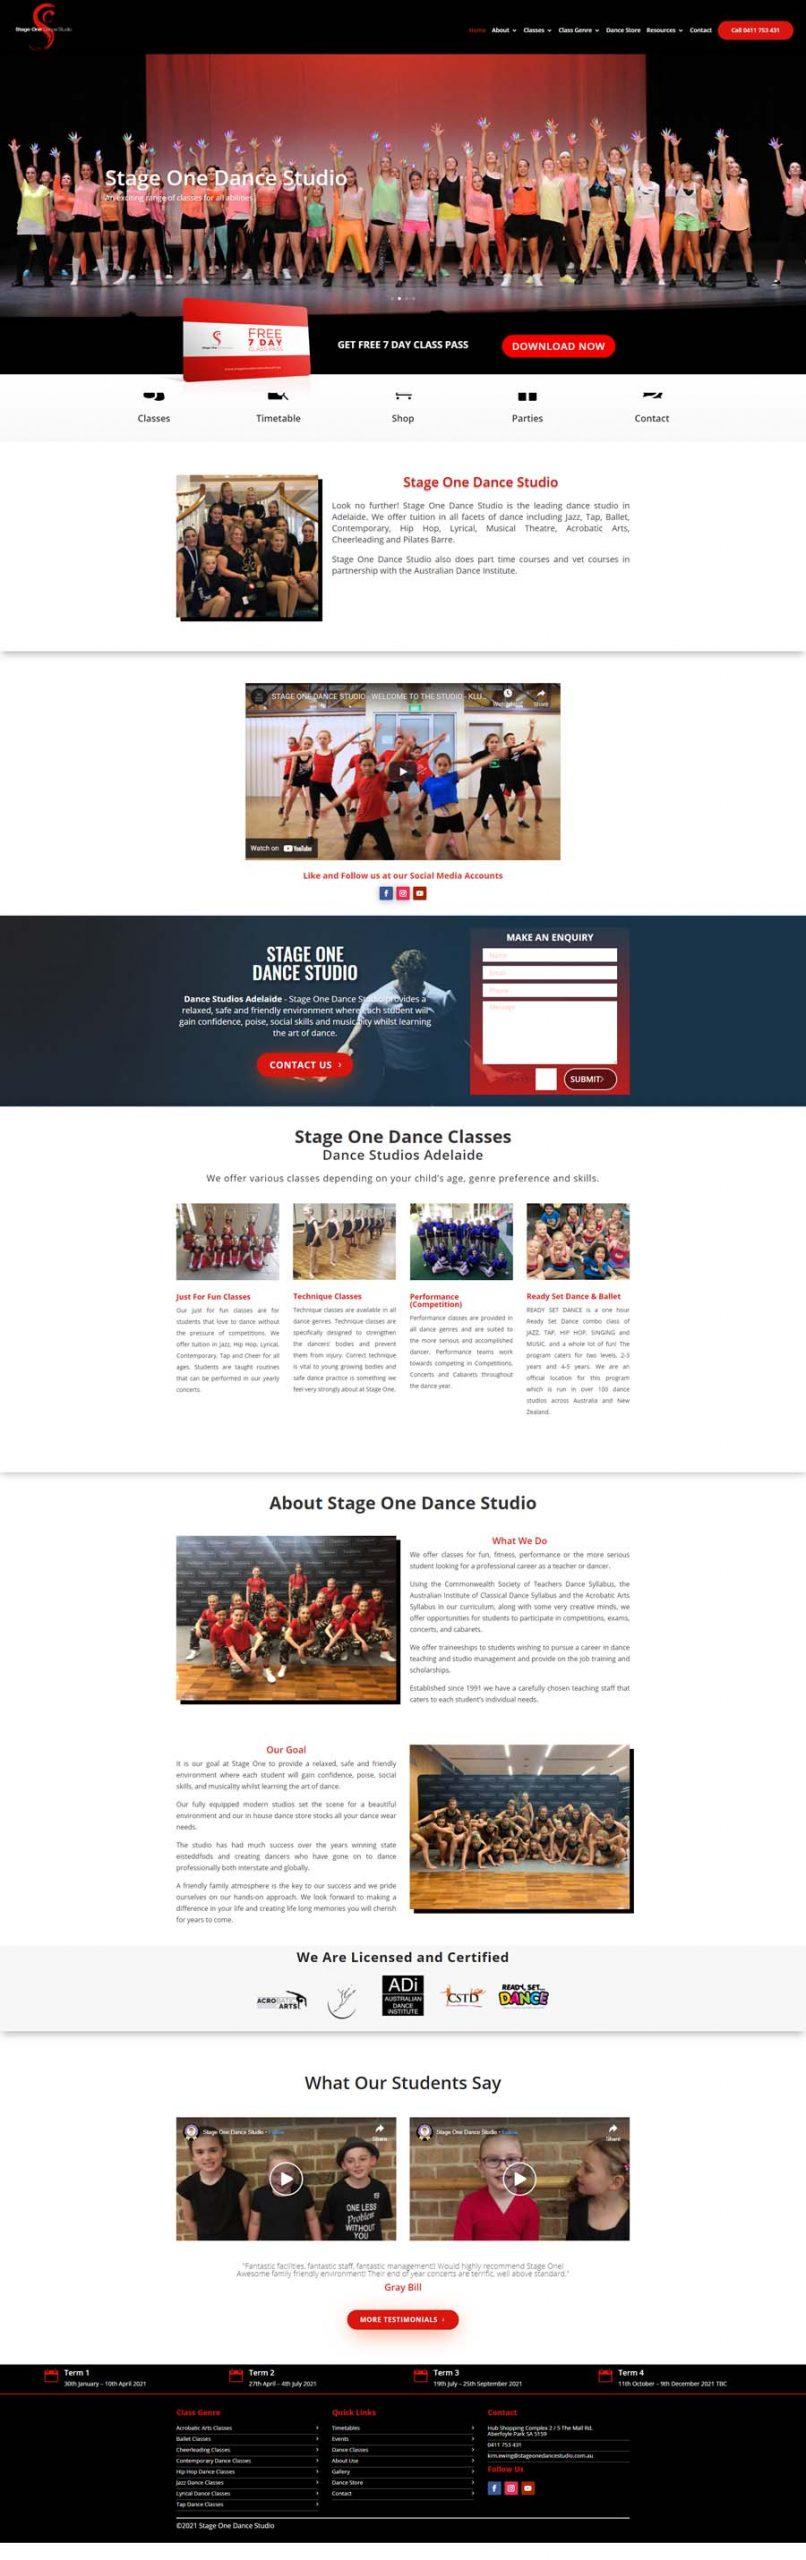 Website Design Adelaide - Dance